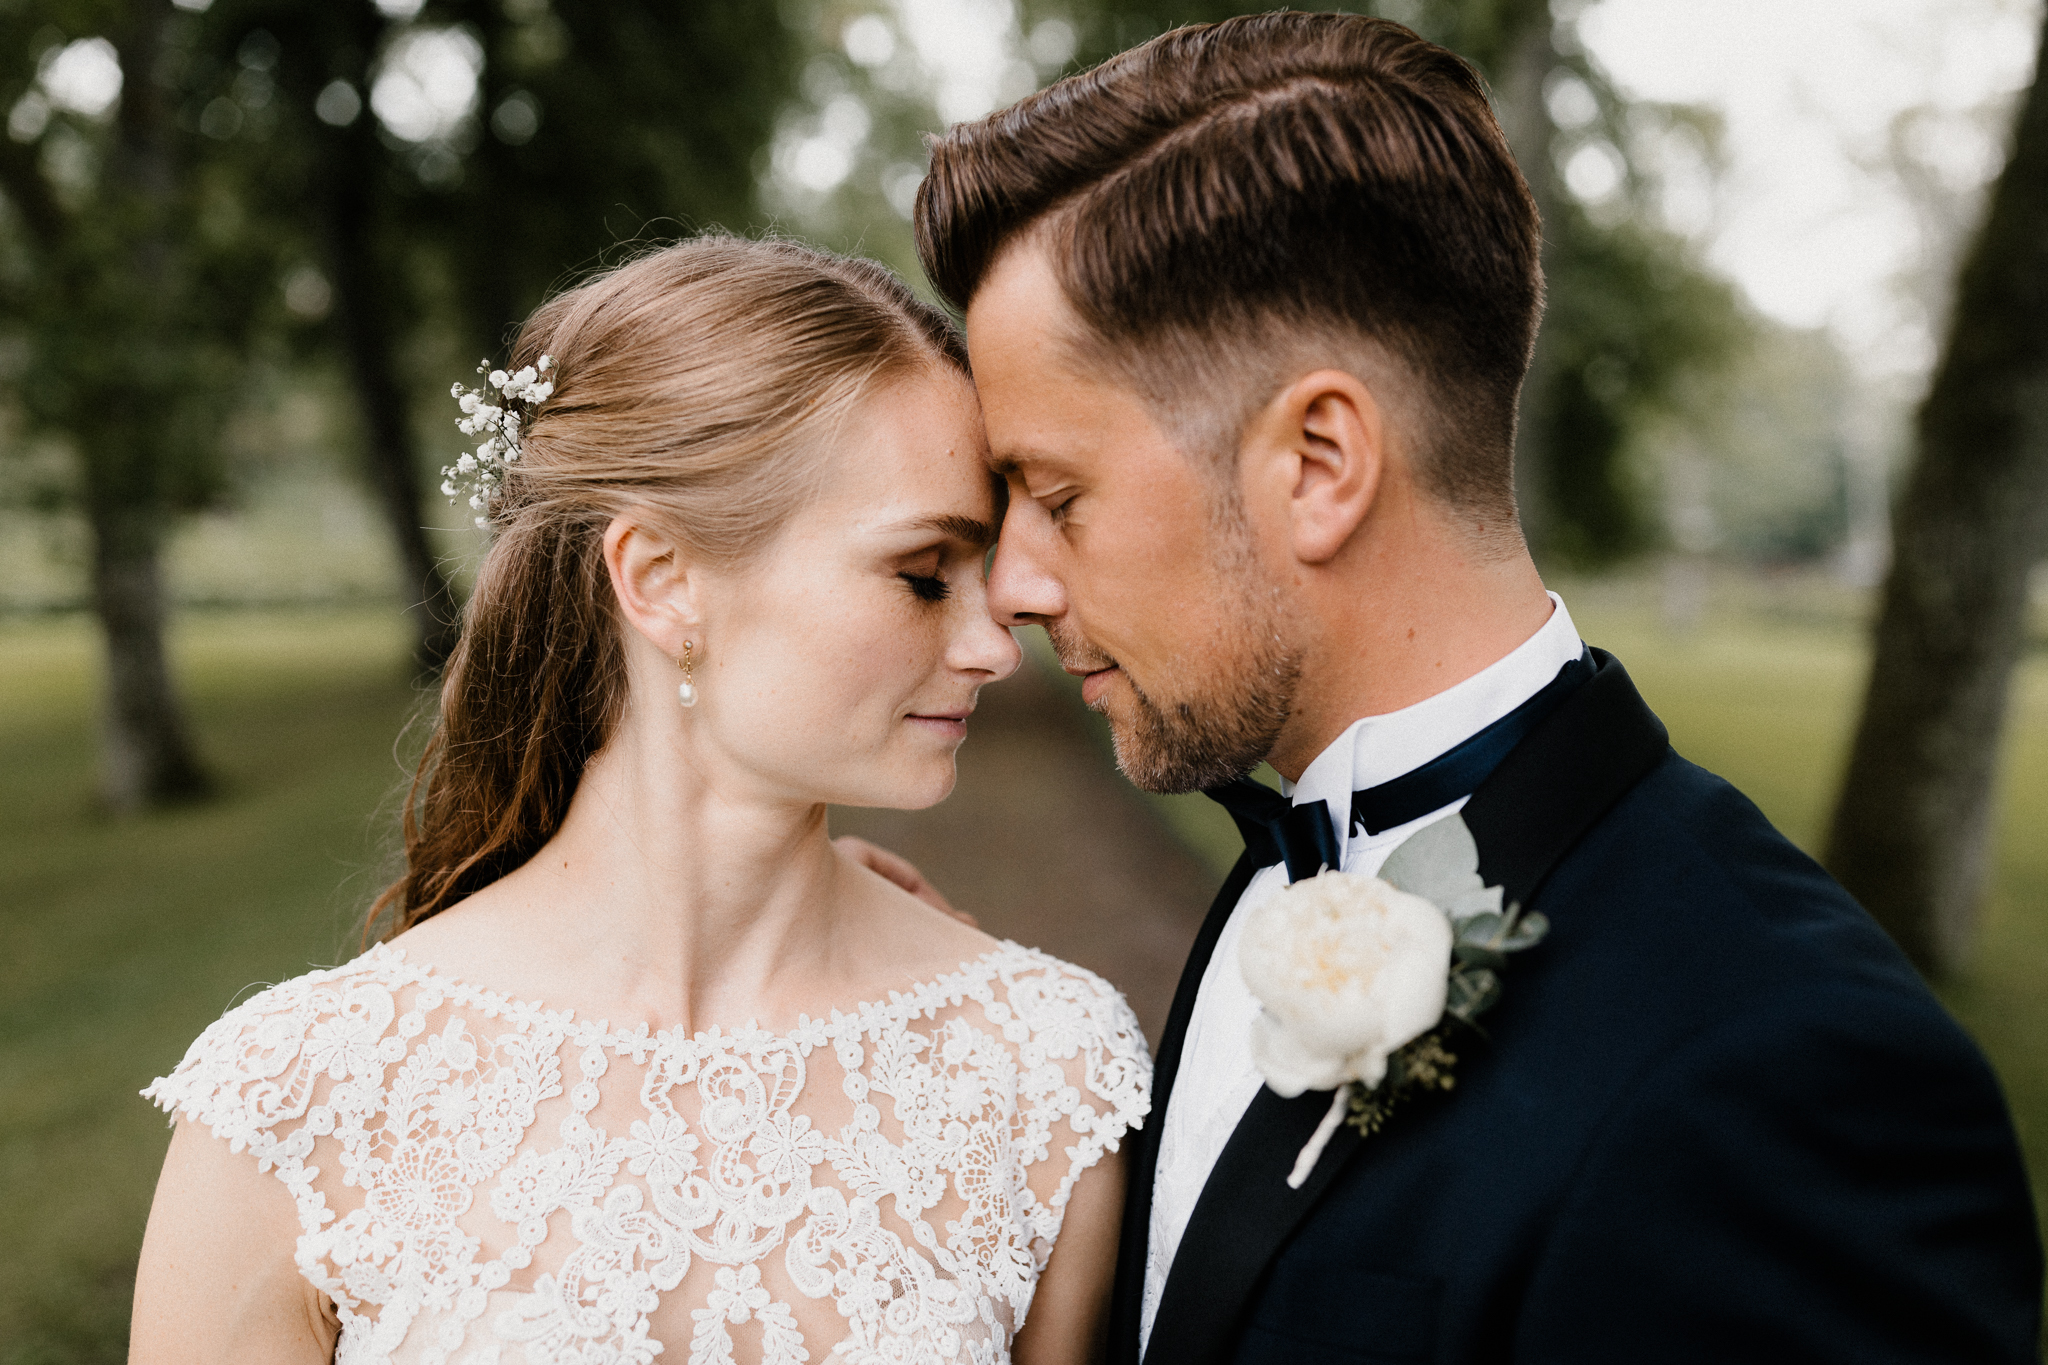 Jessica + Patrick | Fagervik | by Patrick Karkkolainen Wedding Photography-38.jpg